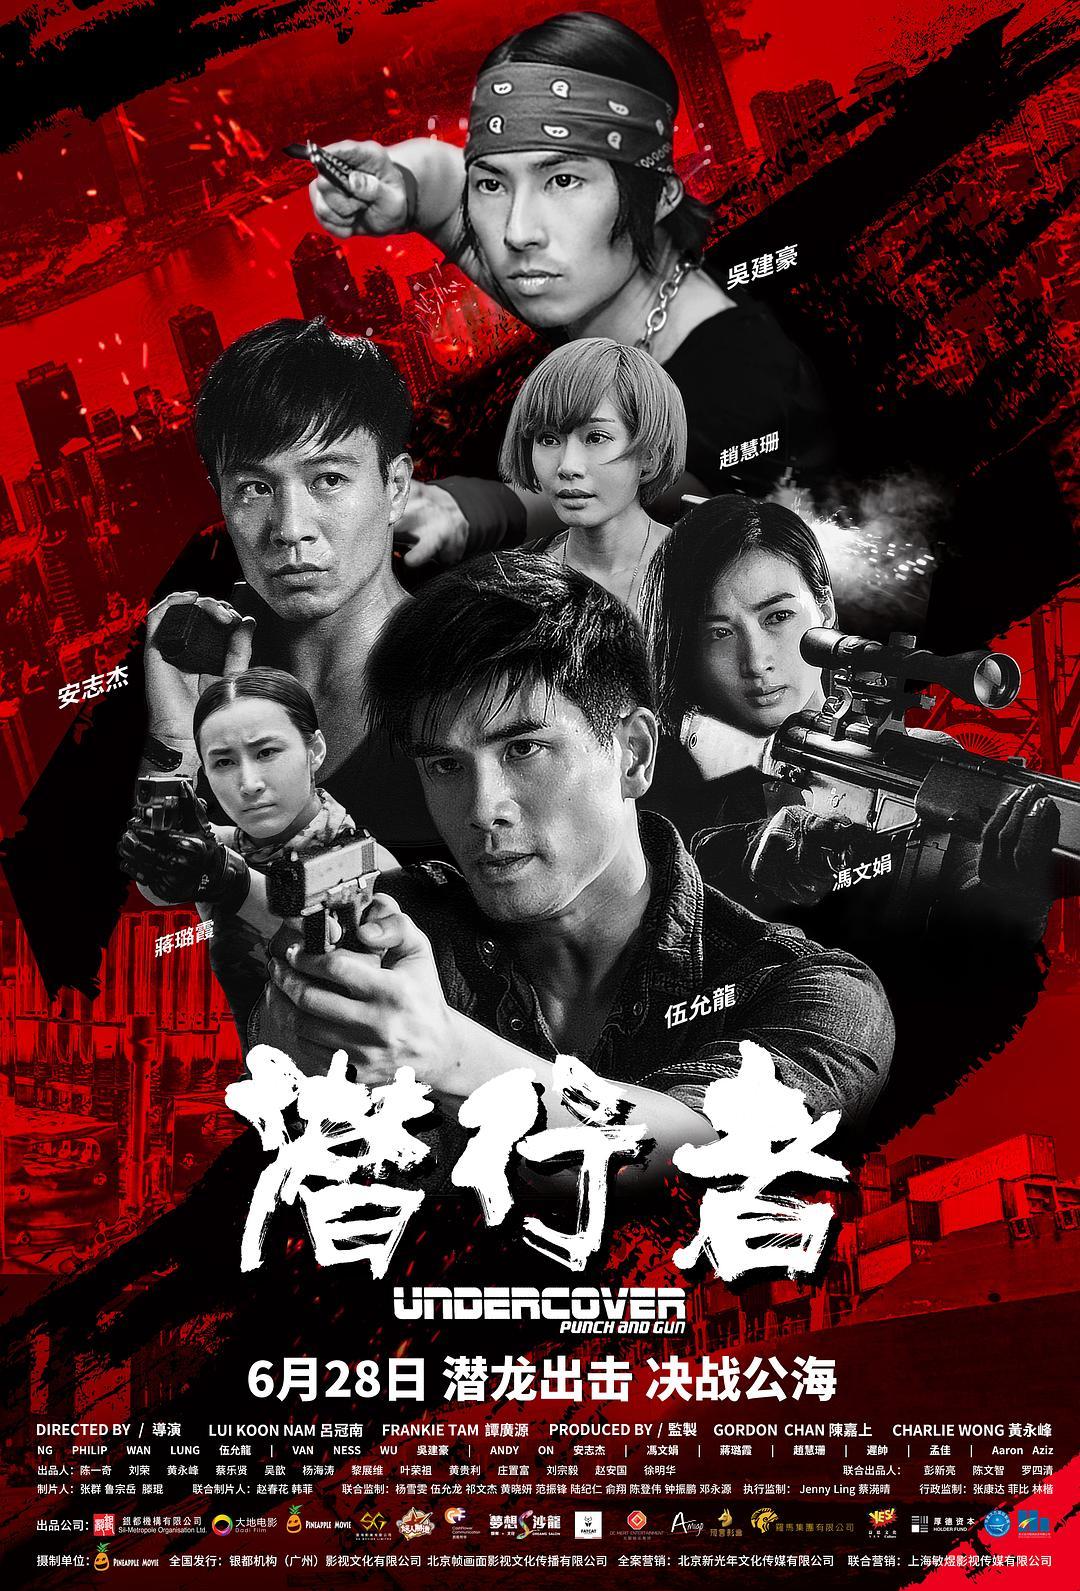 Undercover vs Undercover (2019) Chinese 720p BluRay 1.1GB